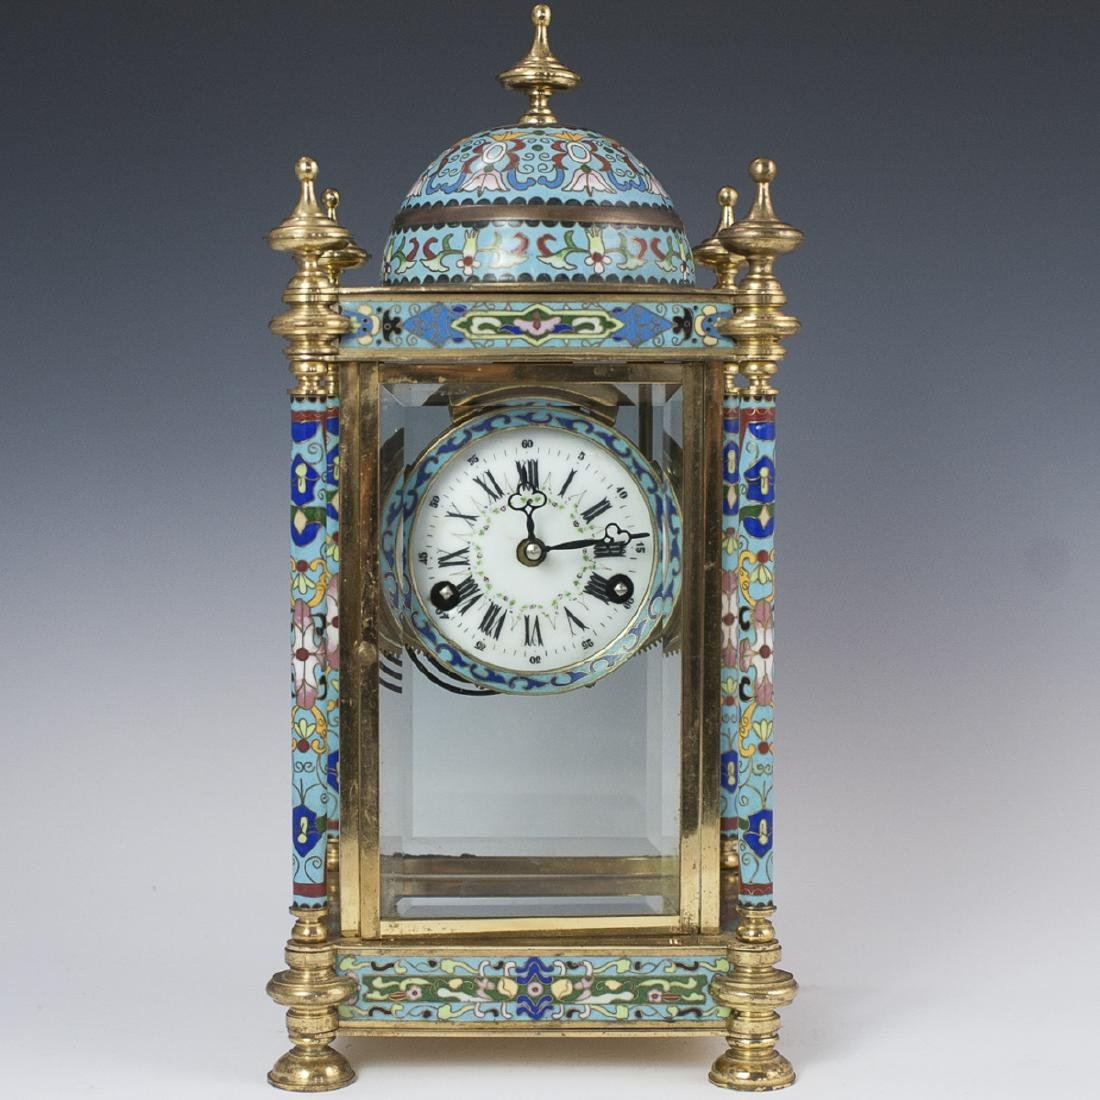 Chinese Republic Enameled Cloisonne Clock